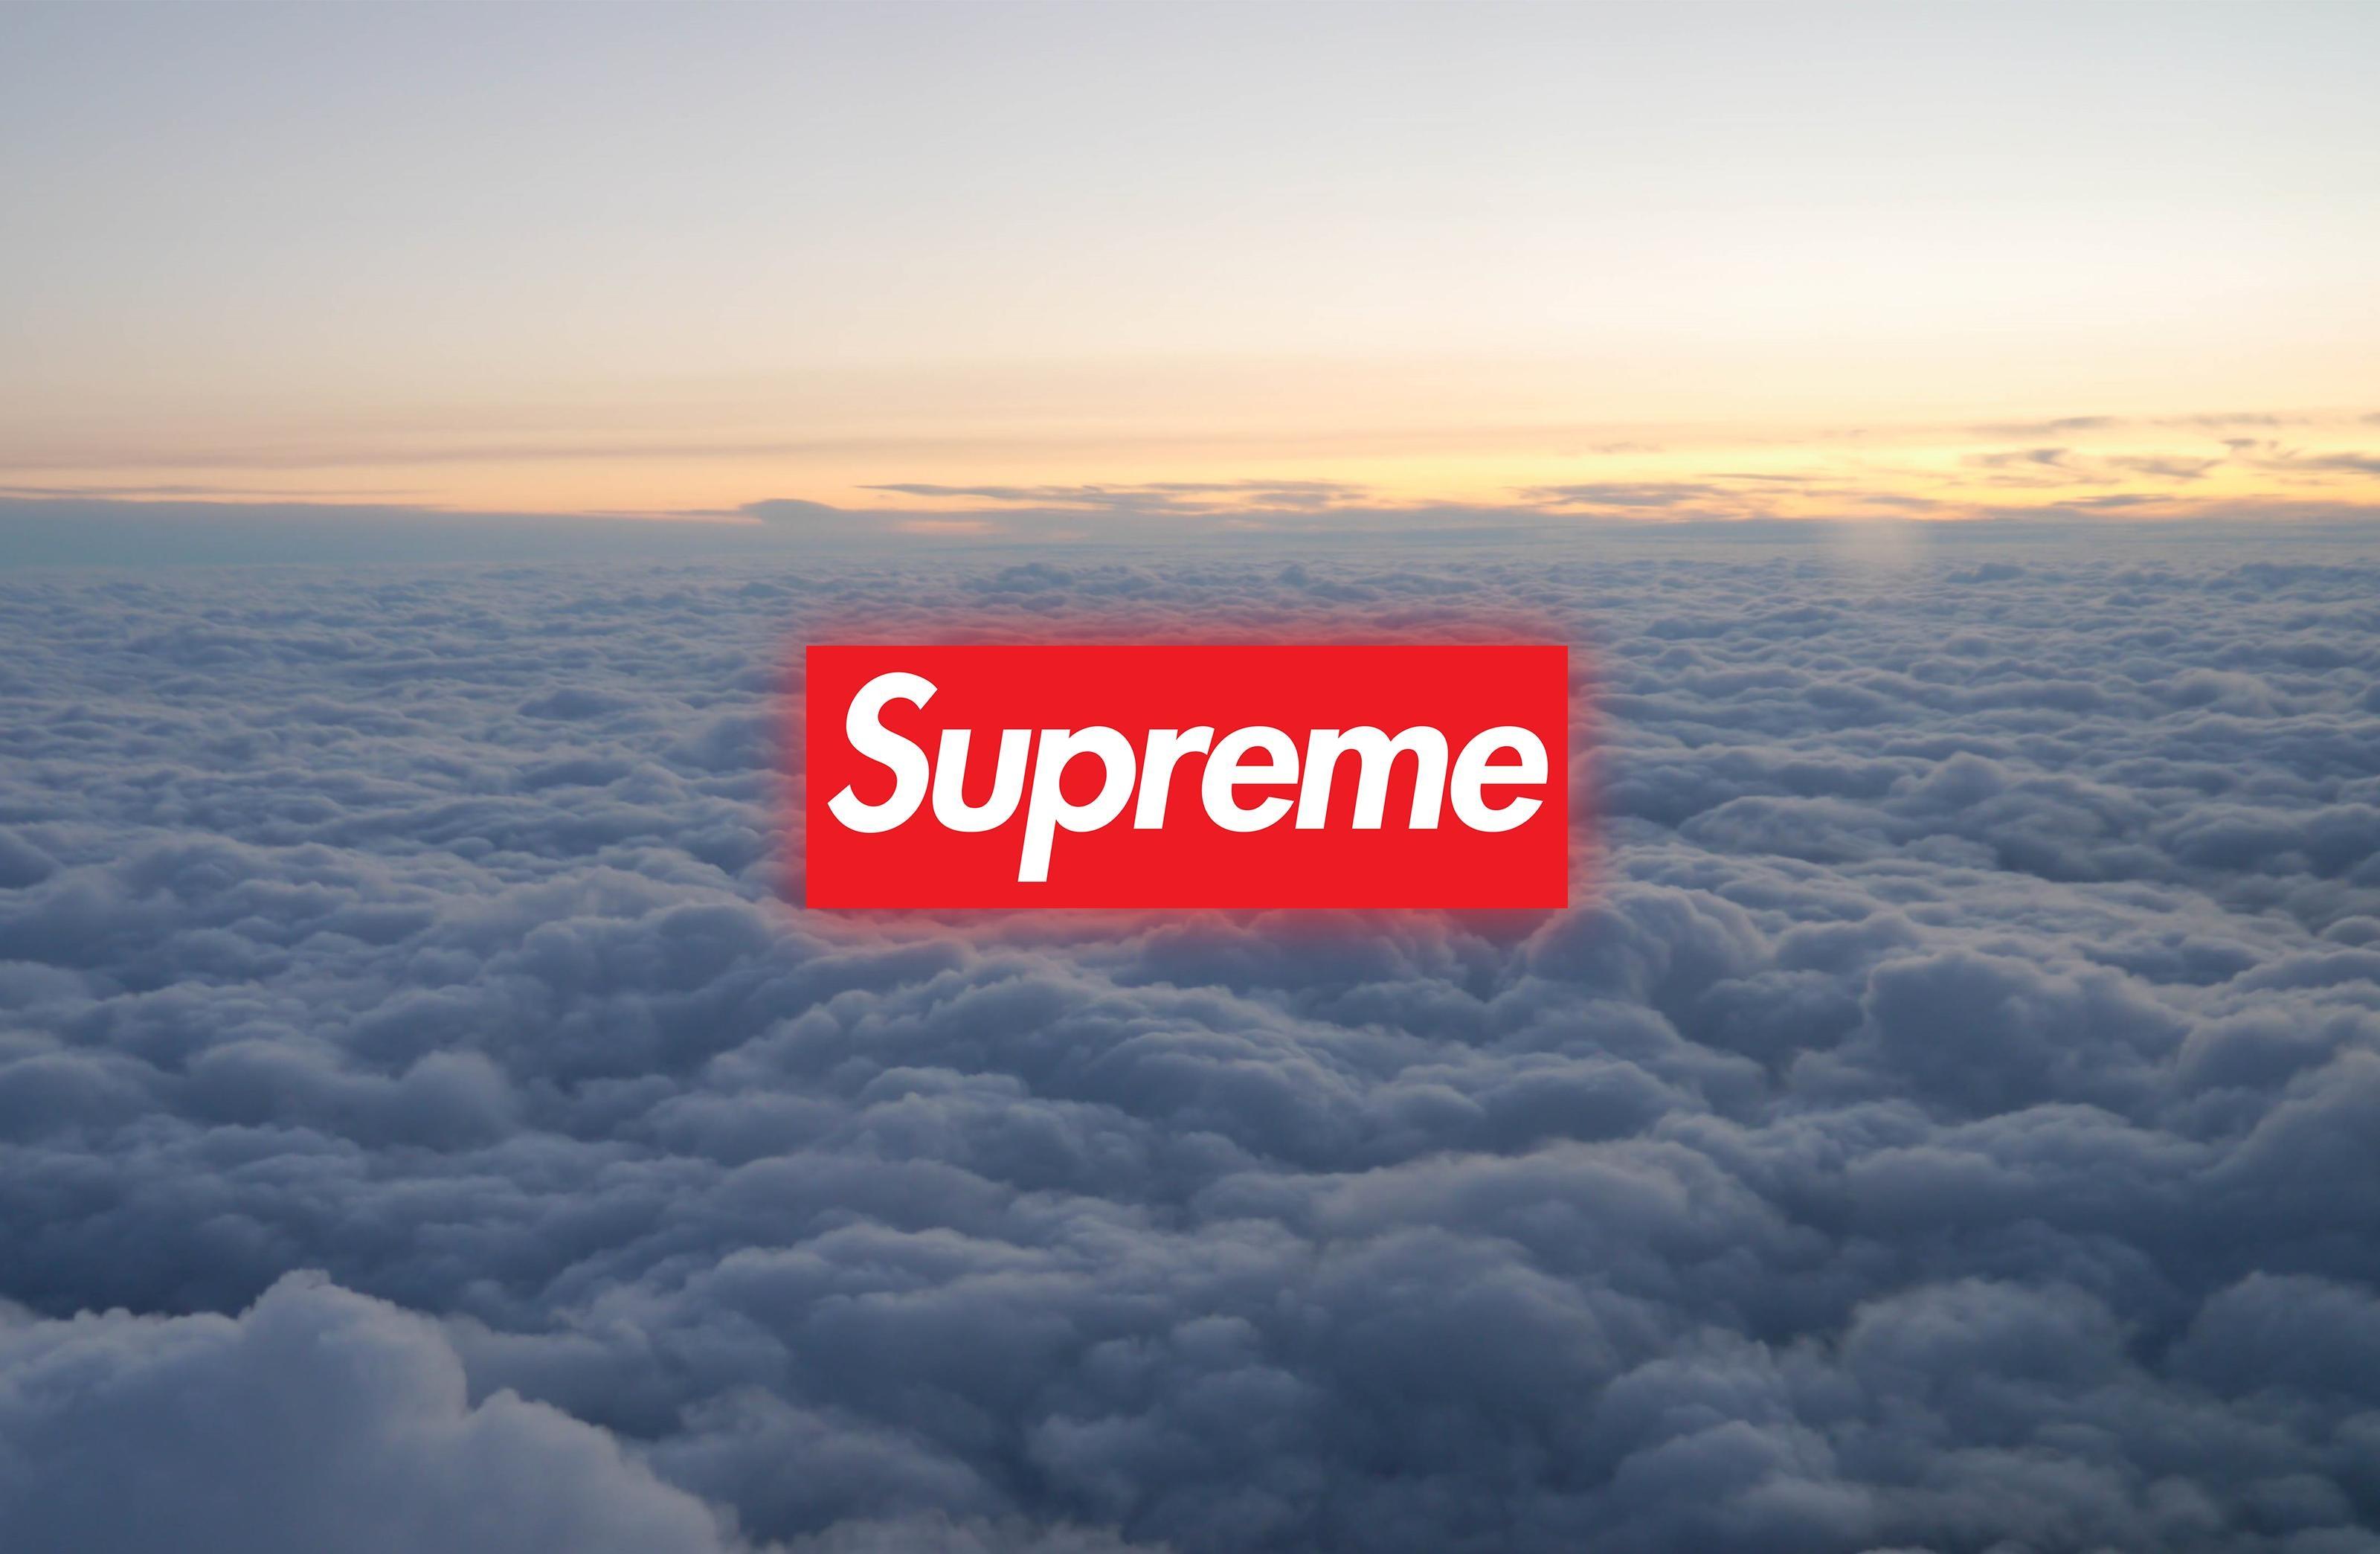 83 Supreme Wallpapers on WallpaperPlay 3200x2089